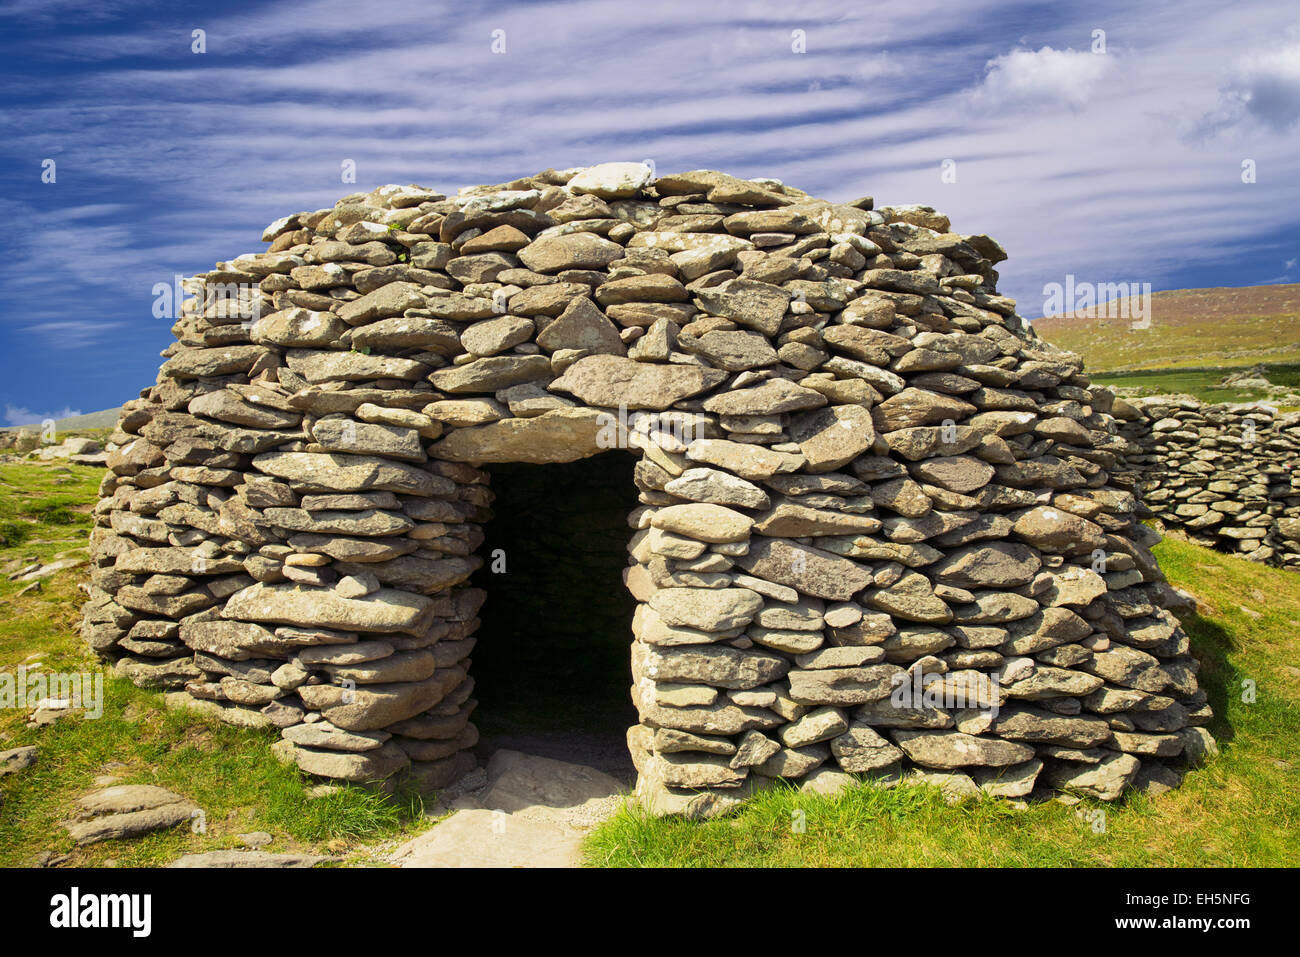 Beehive Hut. Dingle Peninsula, Ireland - Stock Image